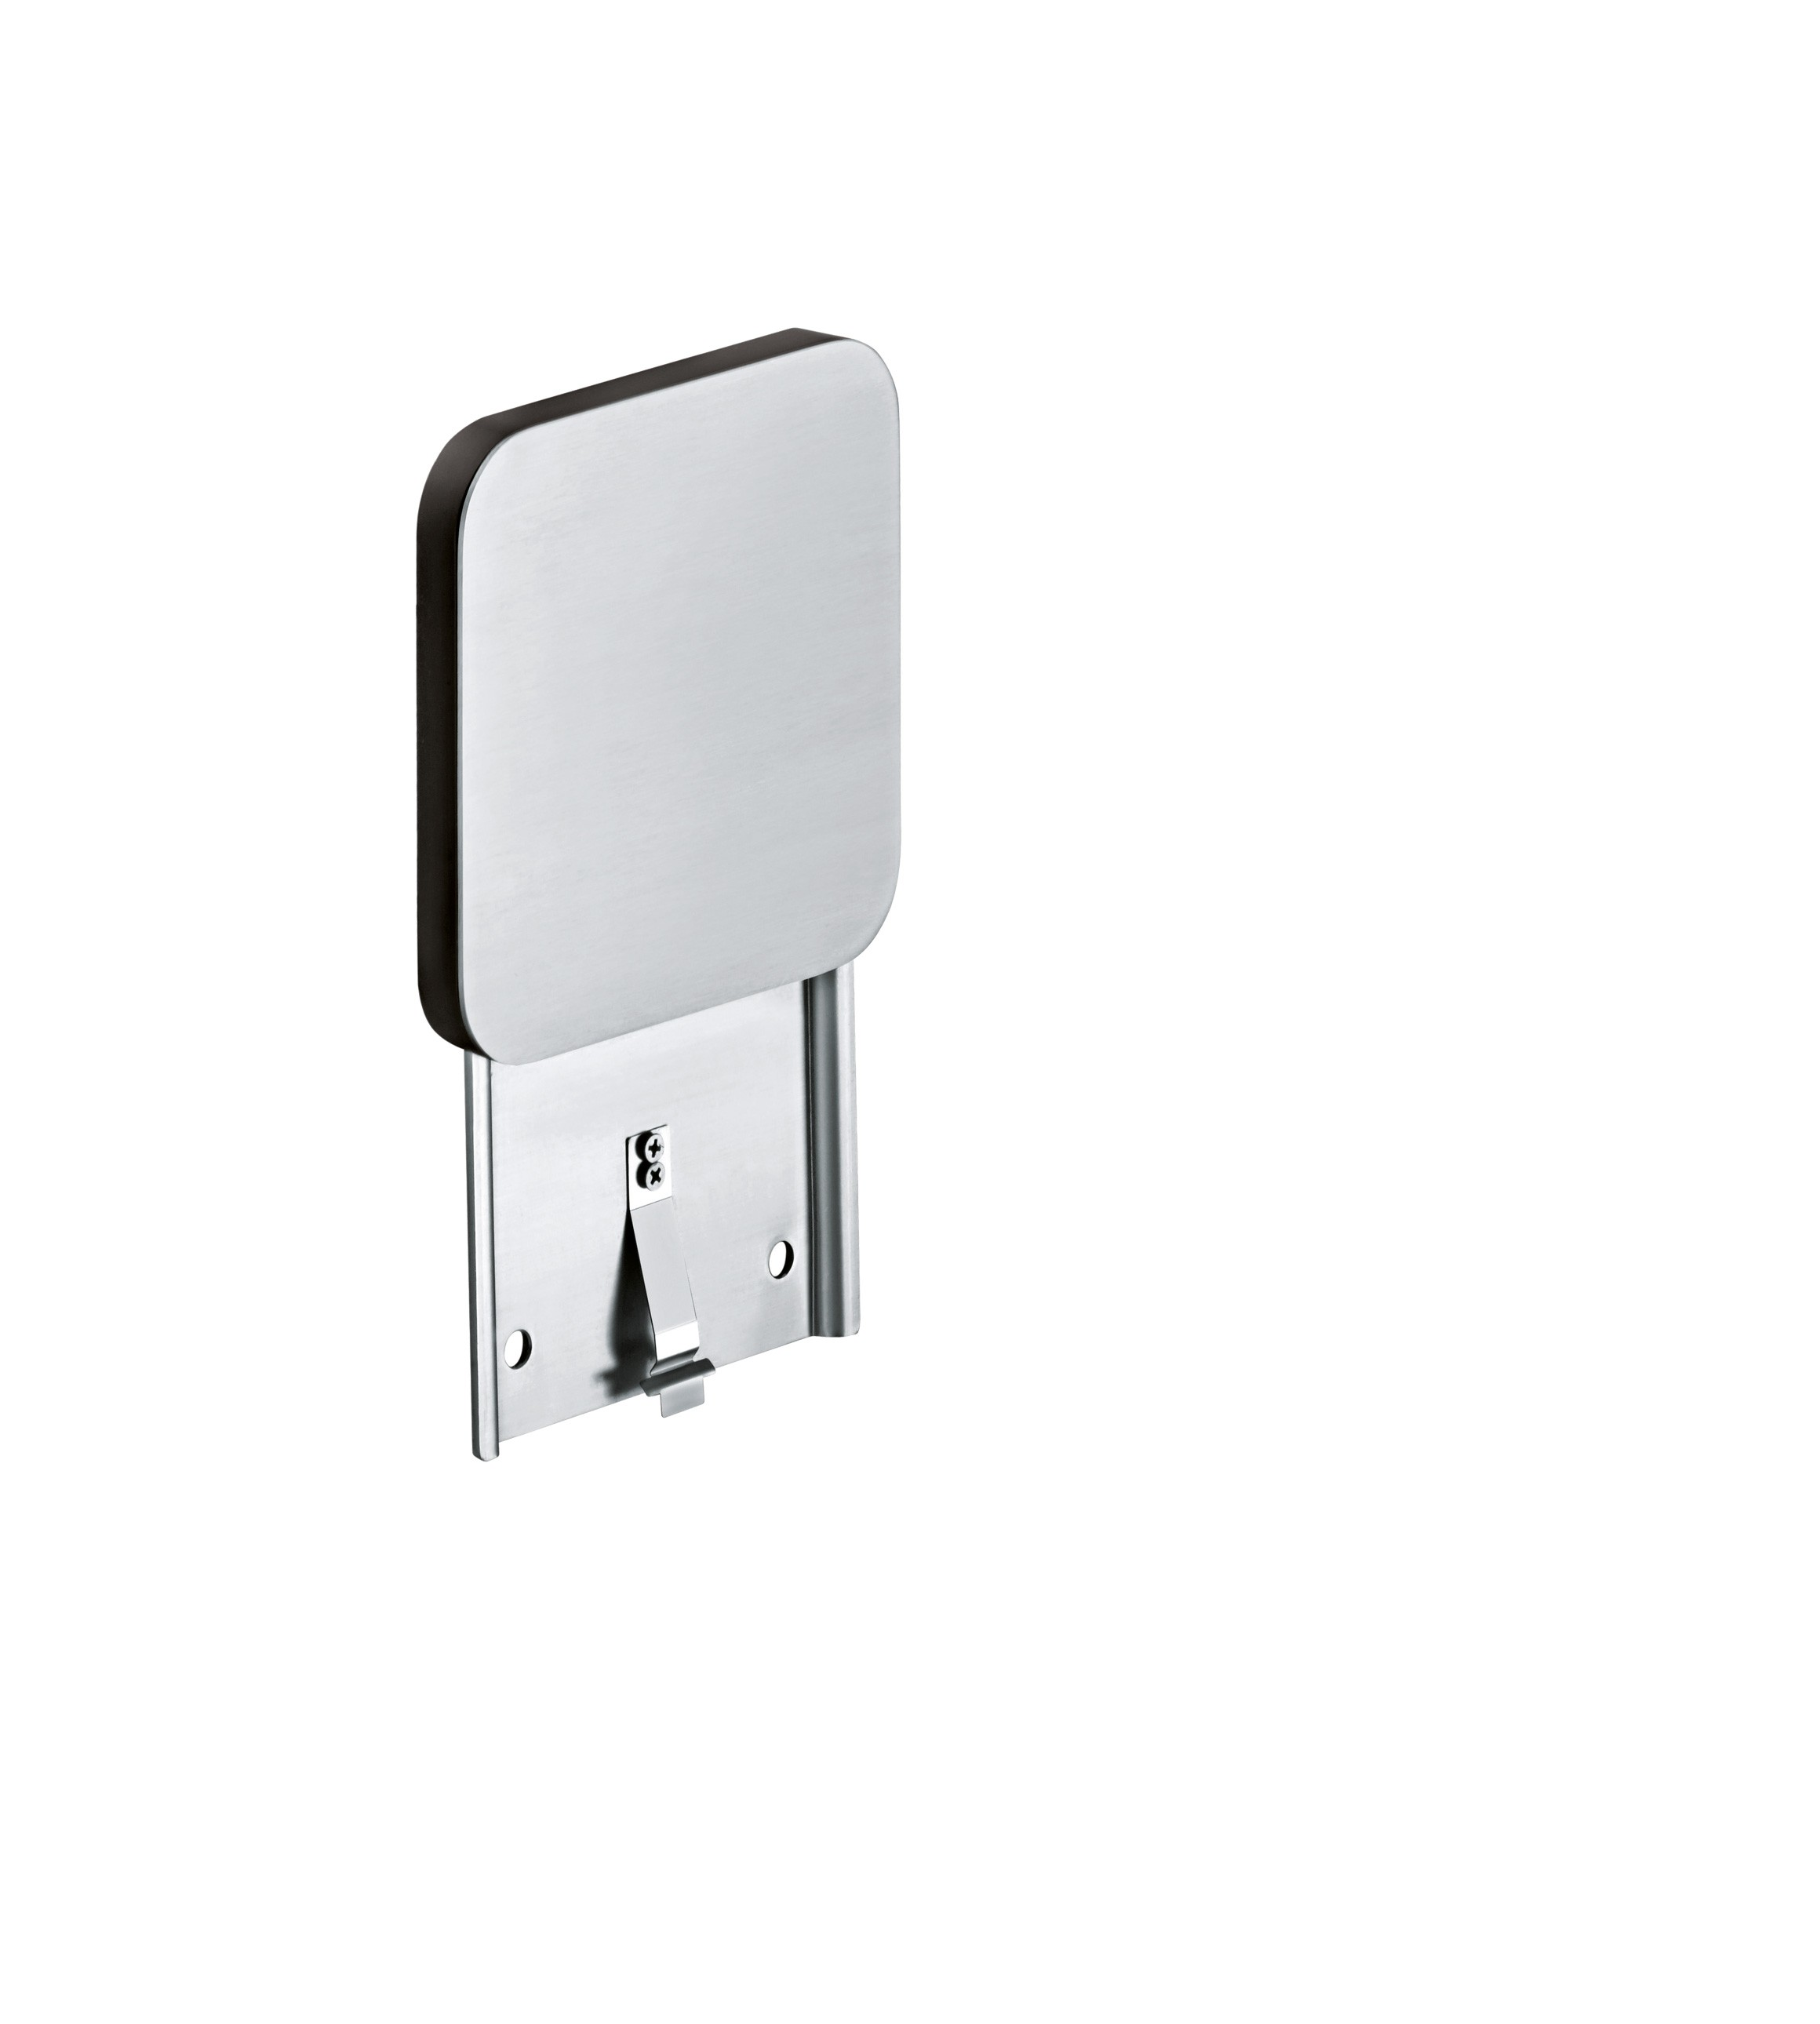 FSB Adapter oval für Klappgriff Edelstahl fein matt (0 82 8227 00001 6204)